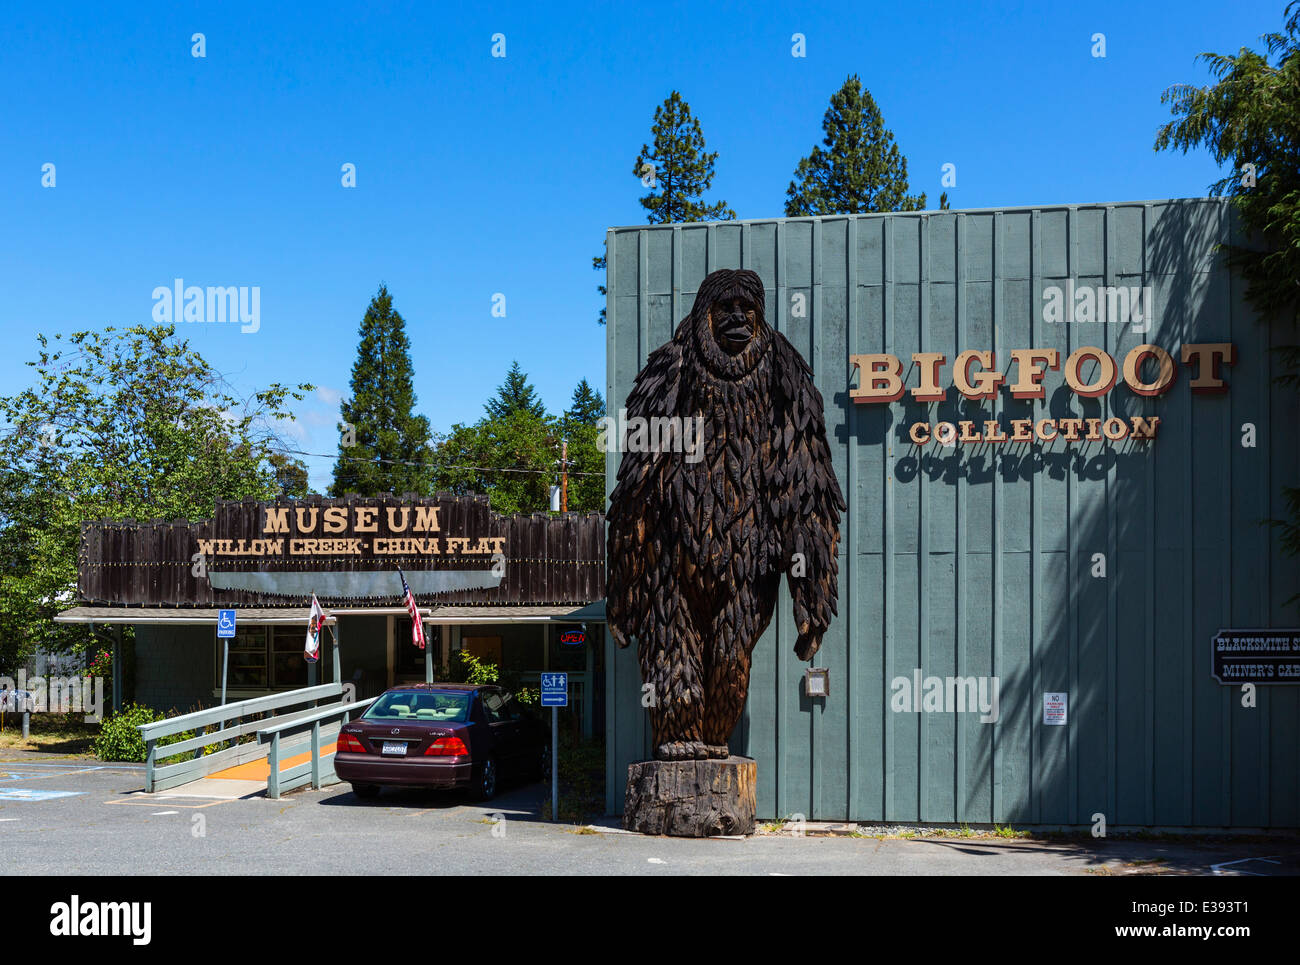 Bigfoot Museum in Willow Creek, Northern California, USA - Stock Image